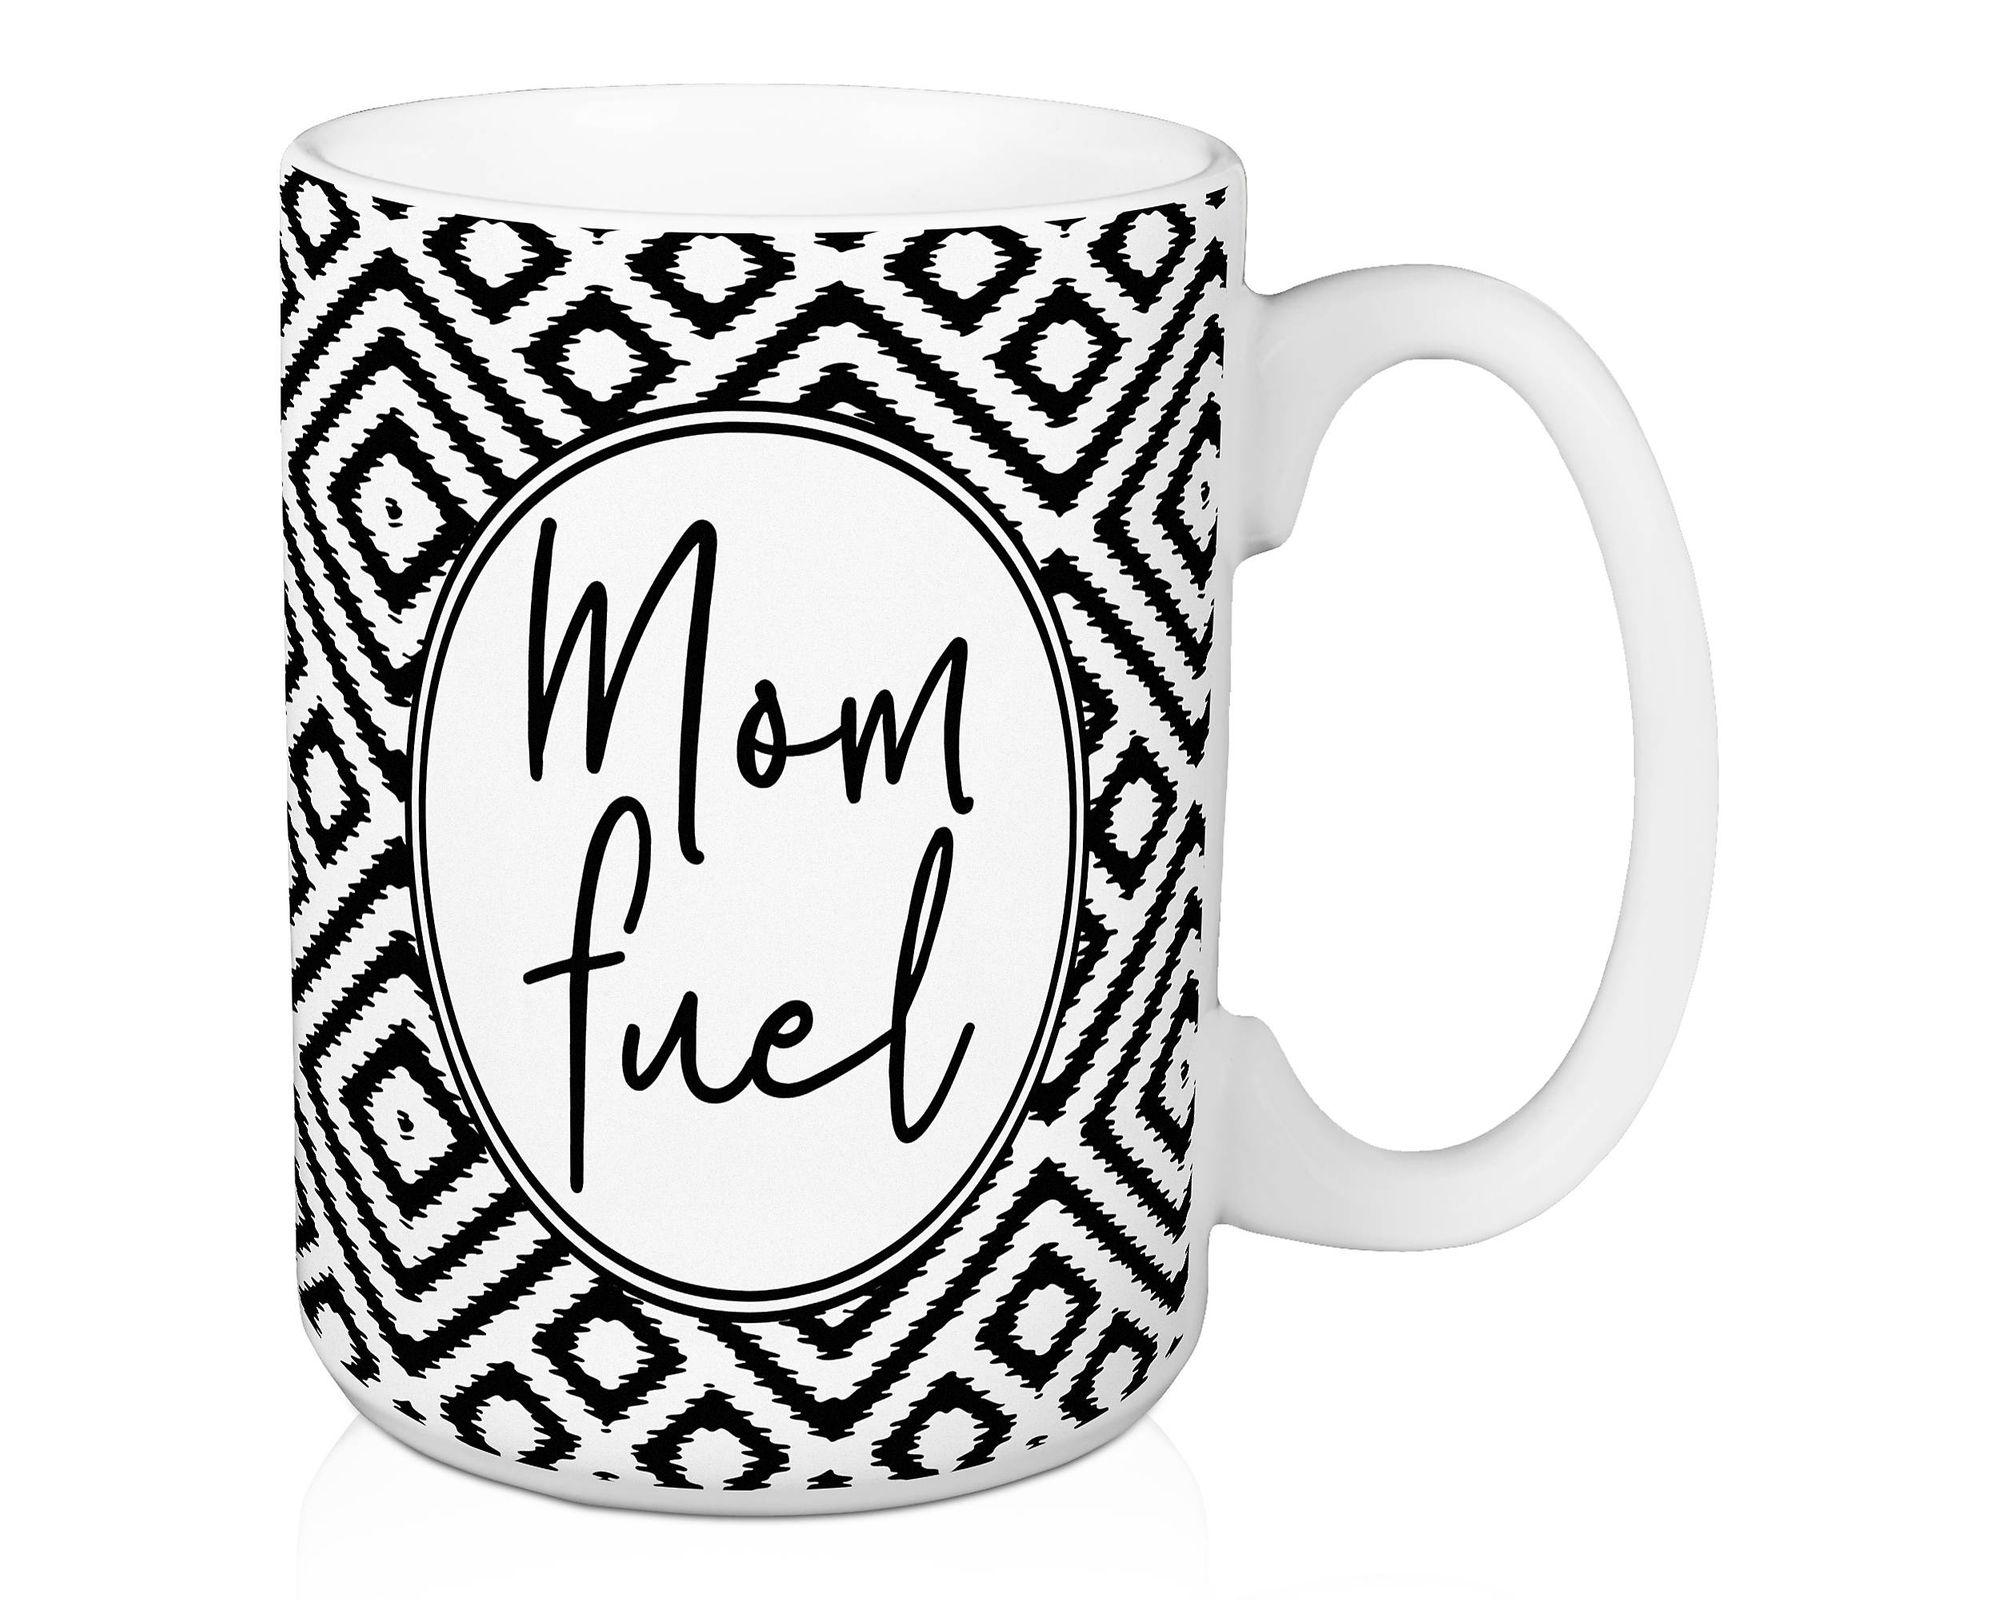 Kirkland's Coffee Mug 16.99 Trending decor, Bright